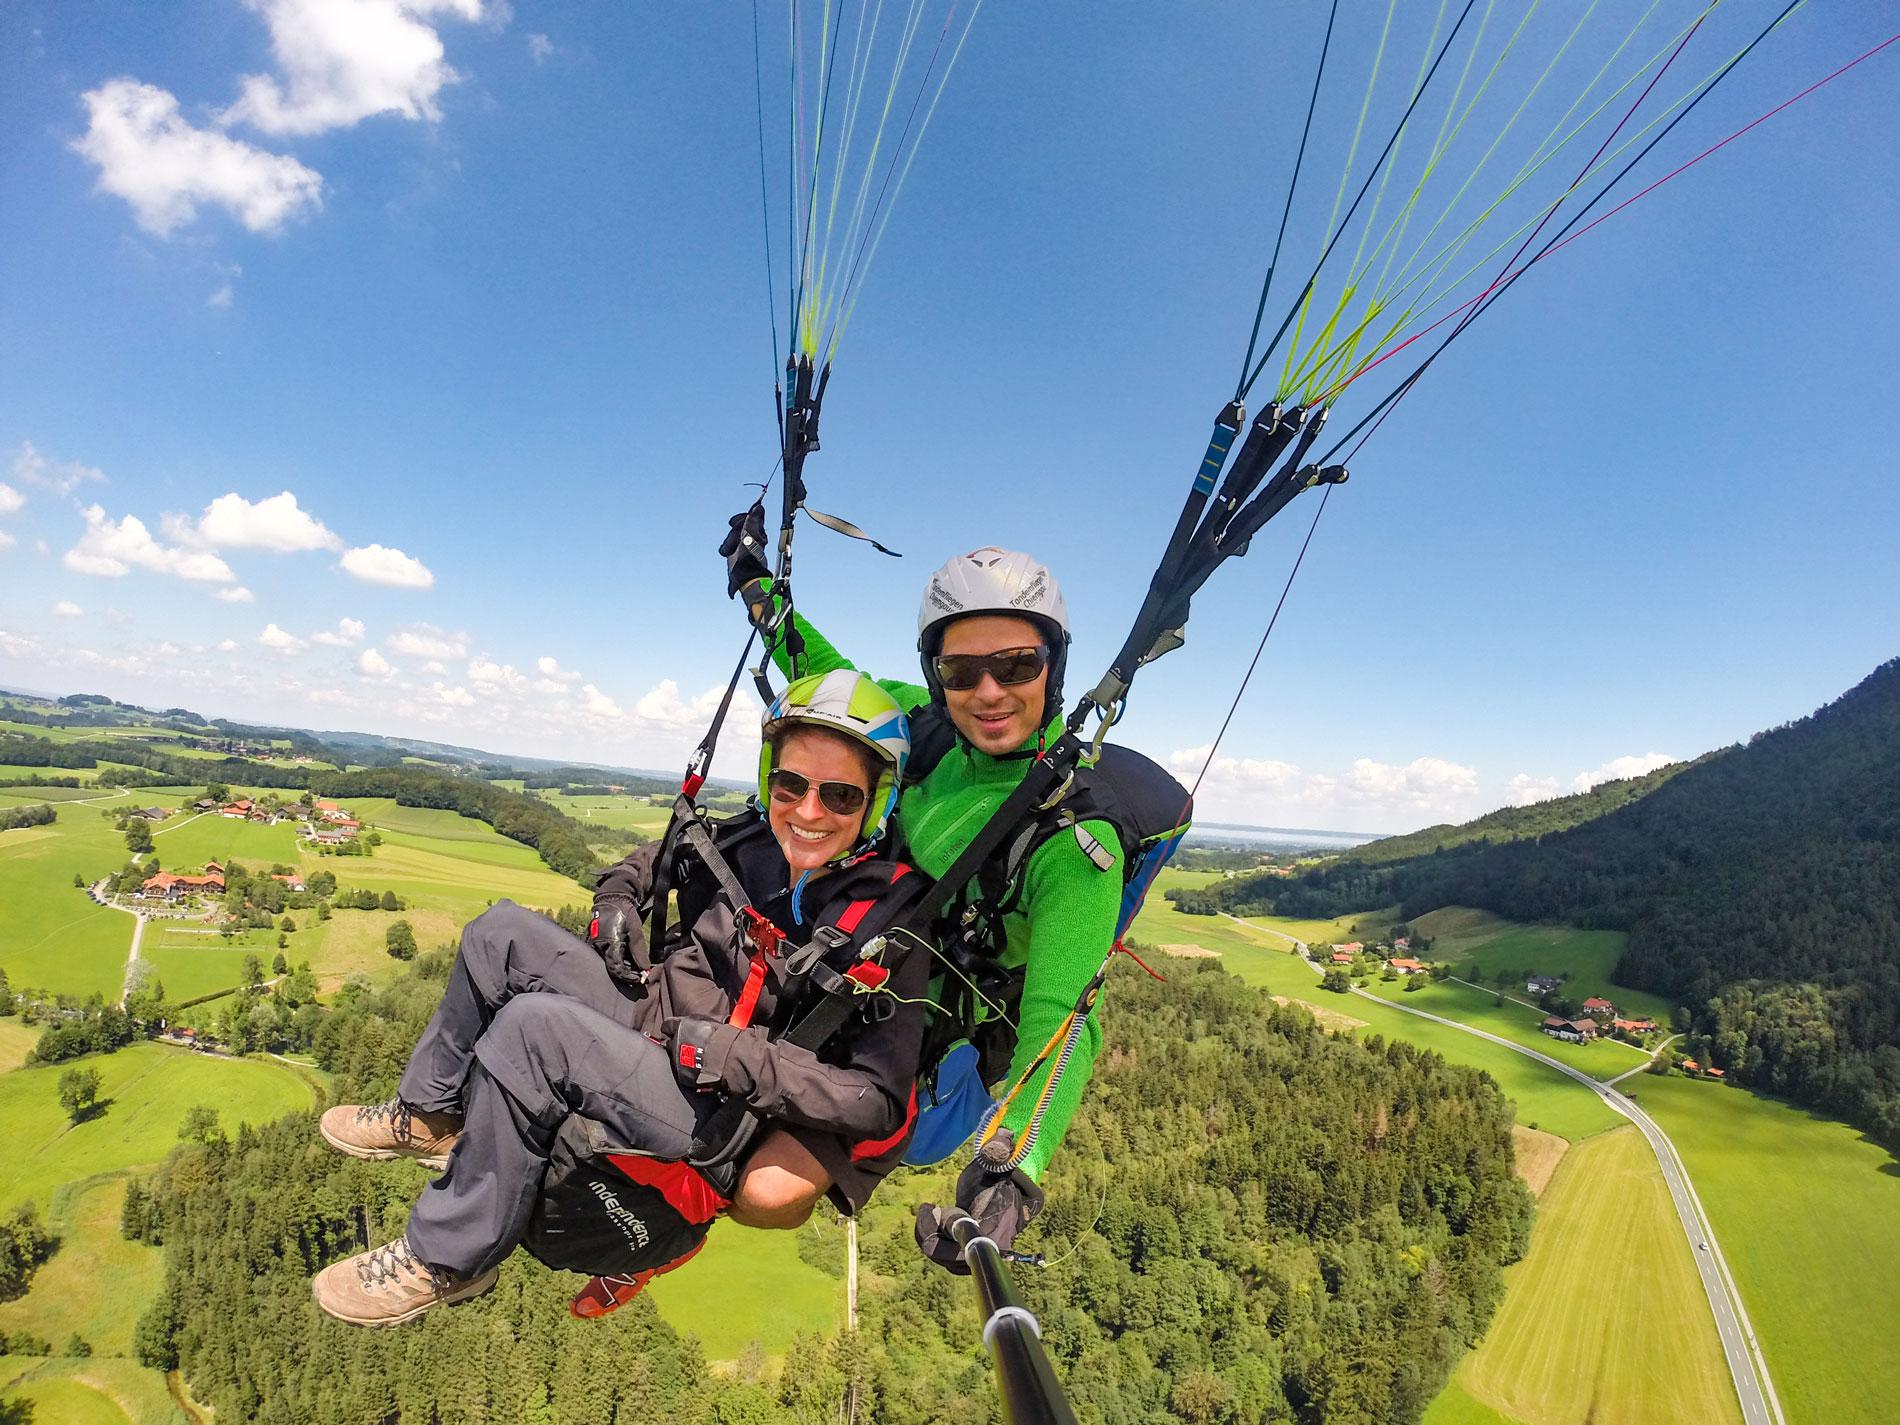 Chiemgau-Klassiker-All-inclusive-Fotoservice-Tandemflug-Gleitschirm-Paragliding